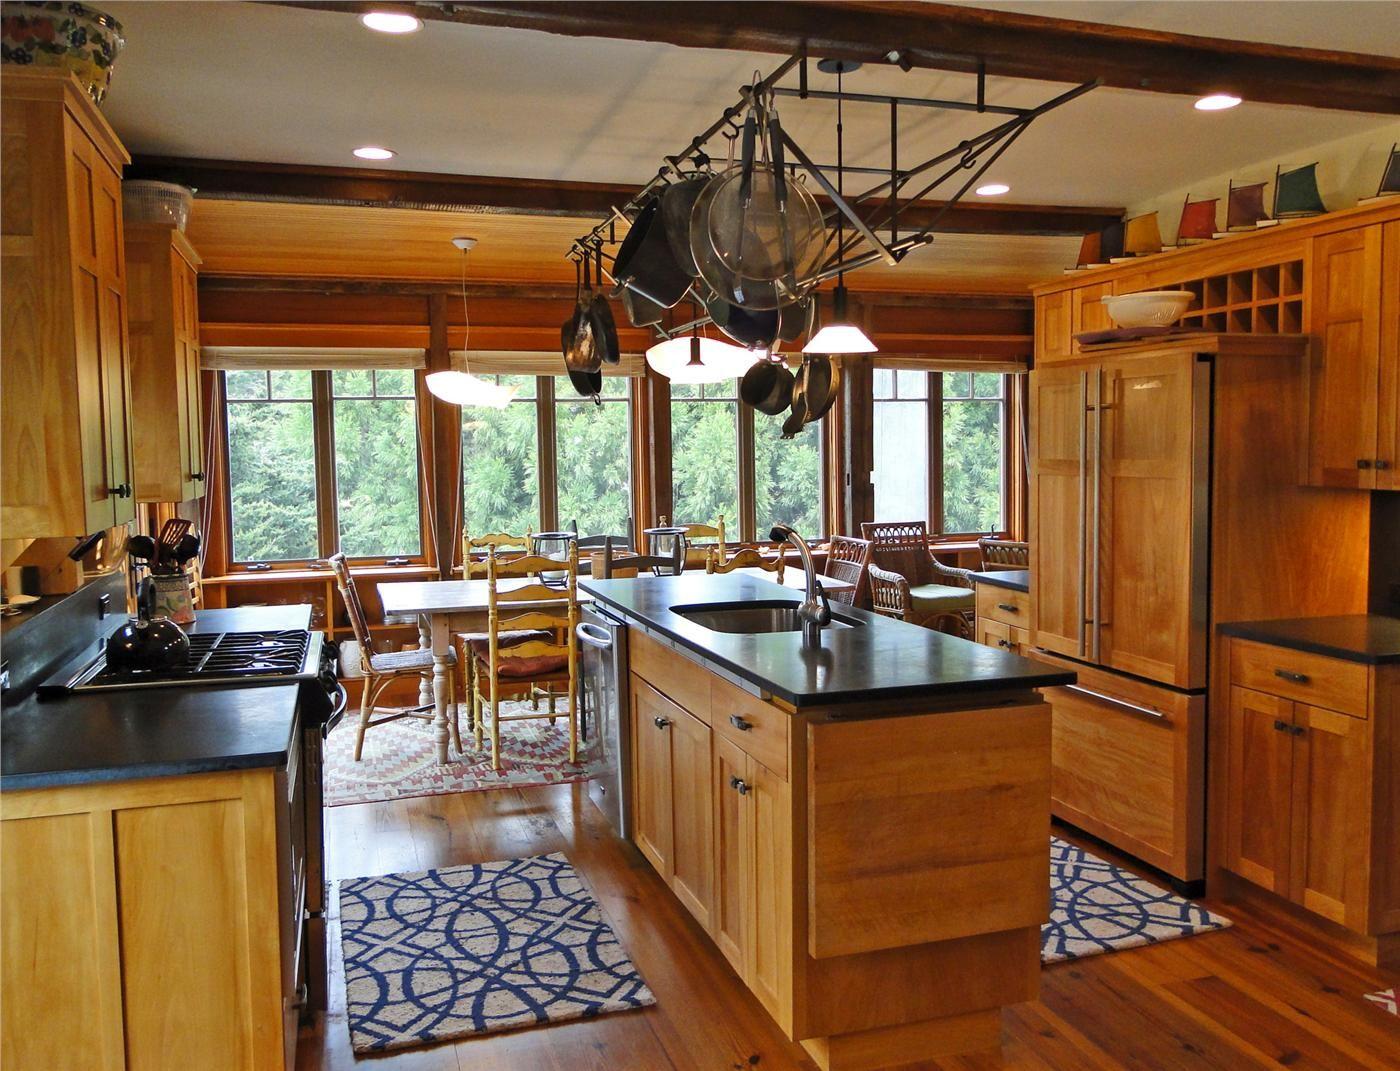 Top Kitchens on Cape Cod, Martha's Vineyard and Nantucket ...